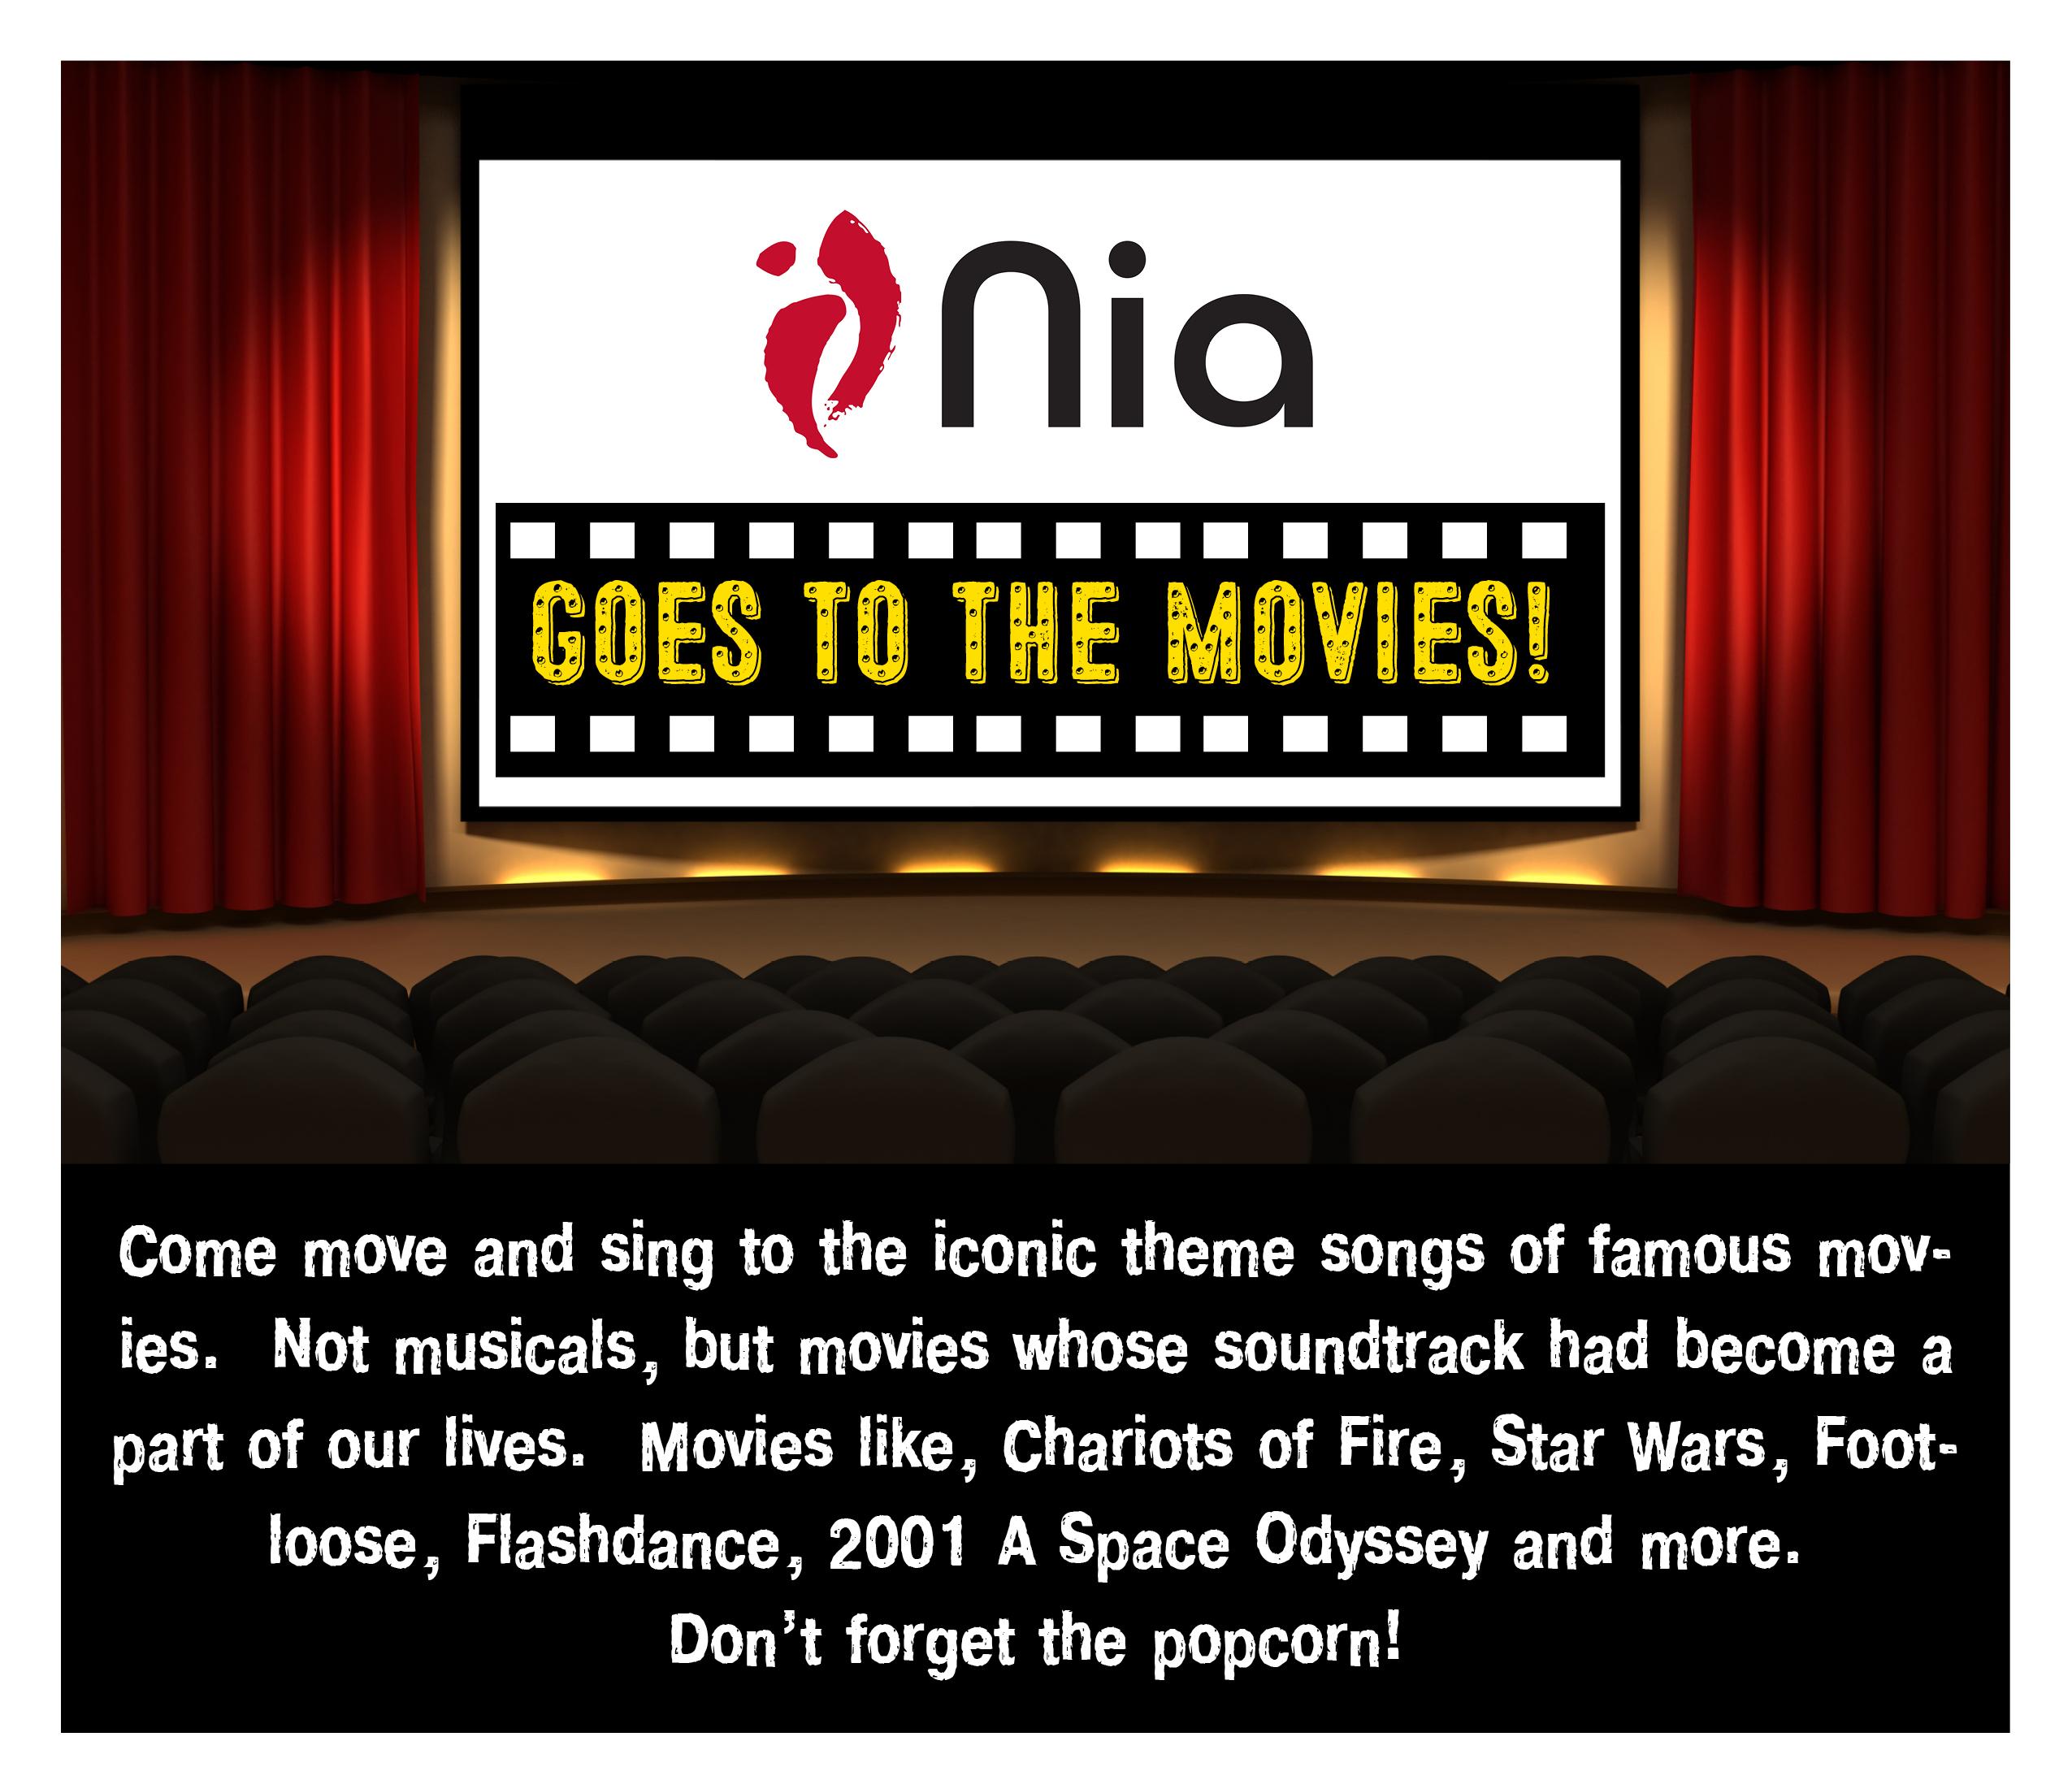 Streaming Nia And Restorative Yoga Classes Via Zoom With Linda All Free New Nia Routine Movie Theme Songs Cape Ann Wellness